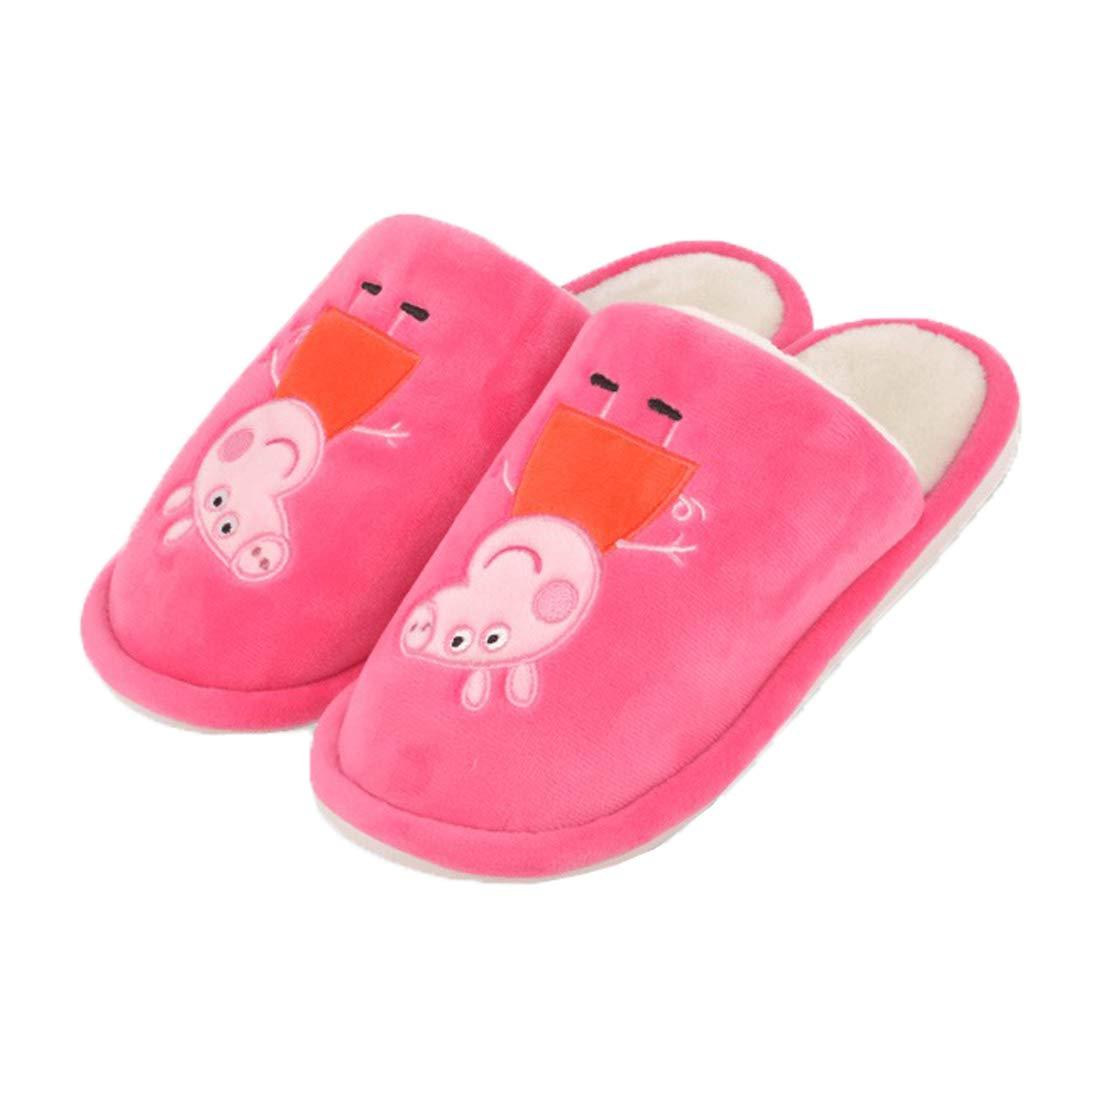 Buy Peppa Pig Plush Slipper 19 cm